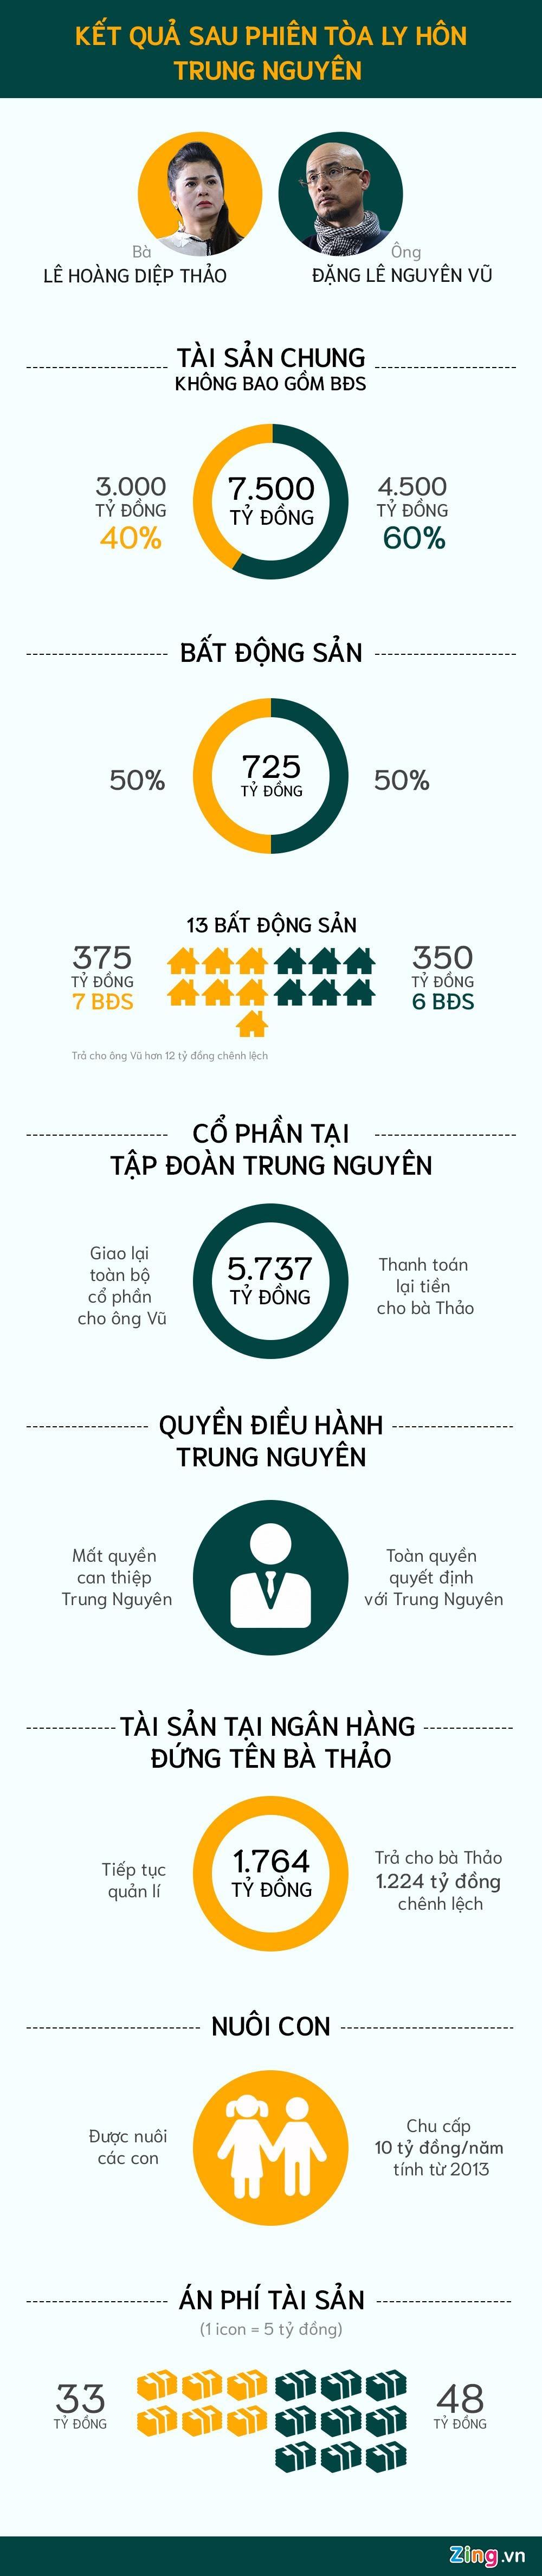 Ket qua phan chia tai san cua vo chong Dang Le Nguyen Vu hinh anh 1